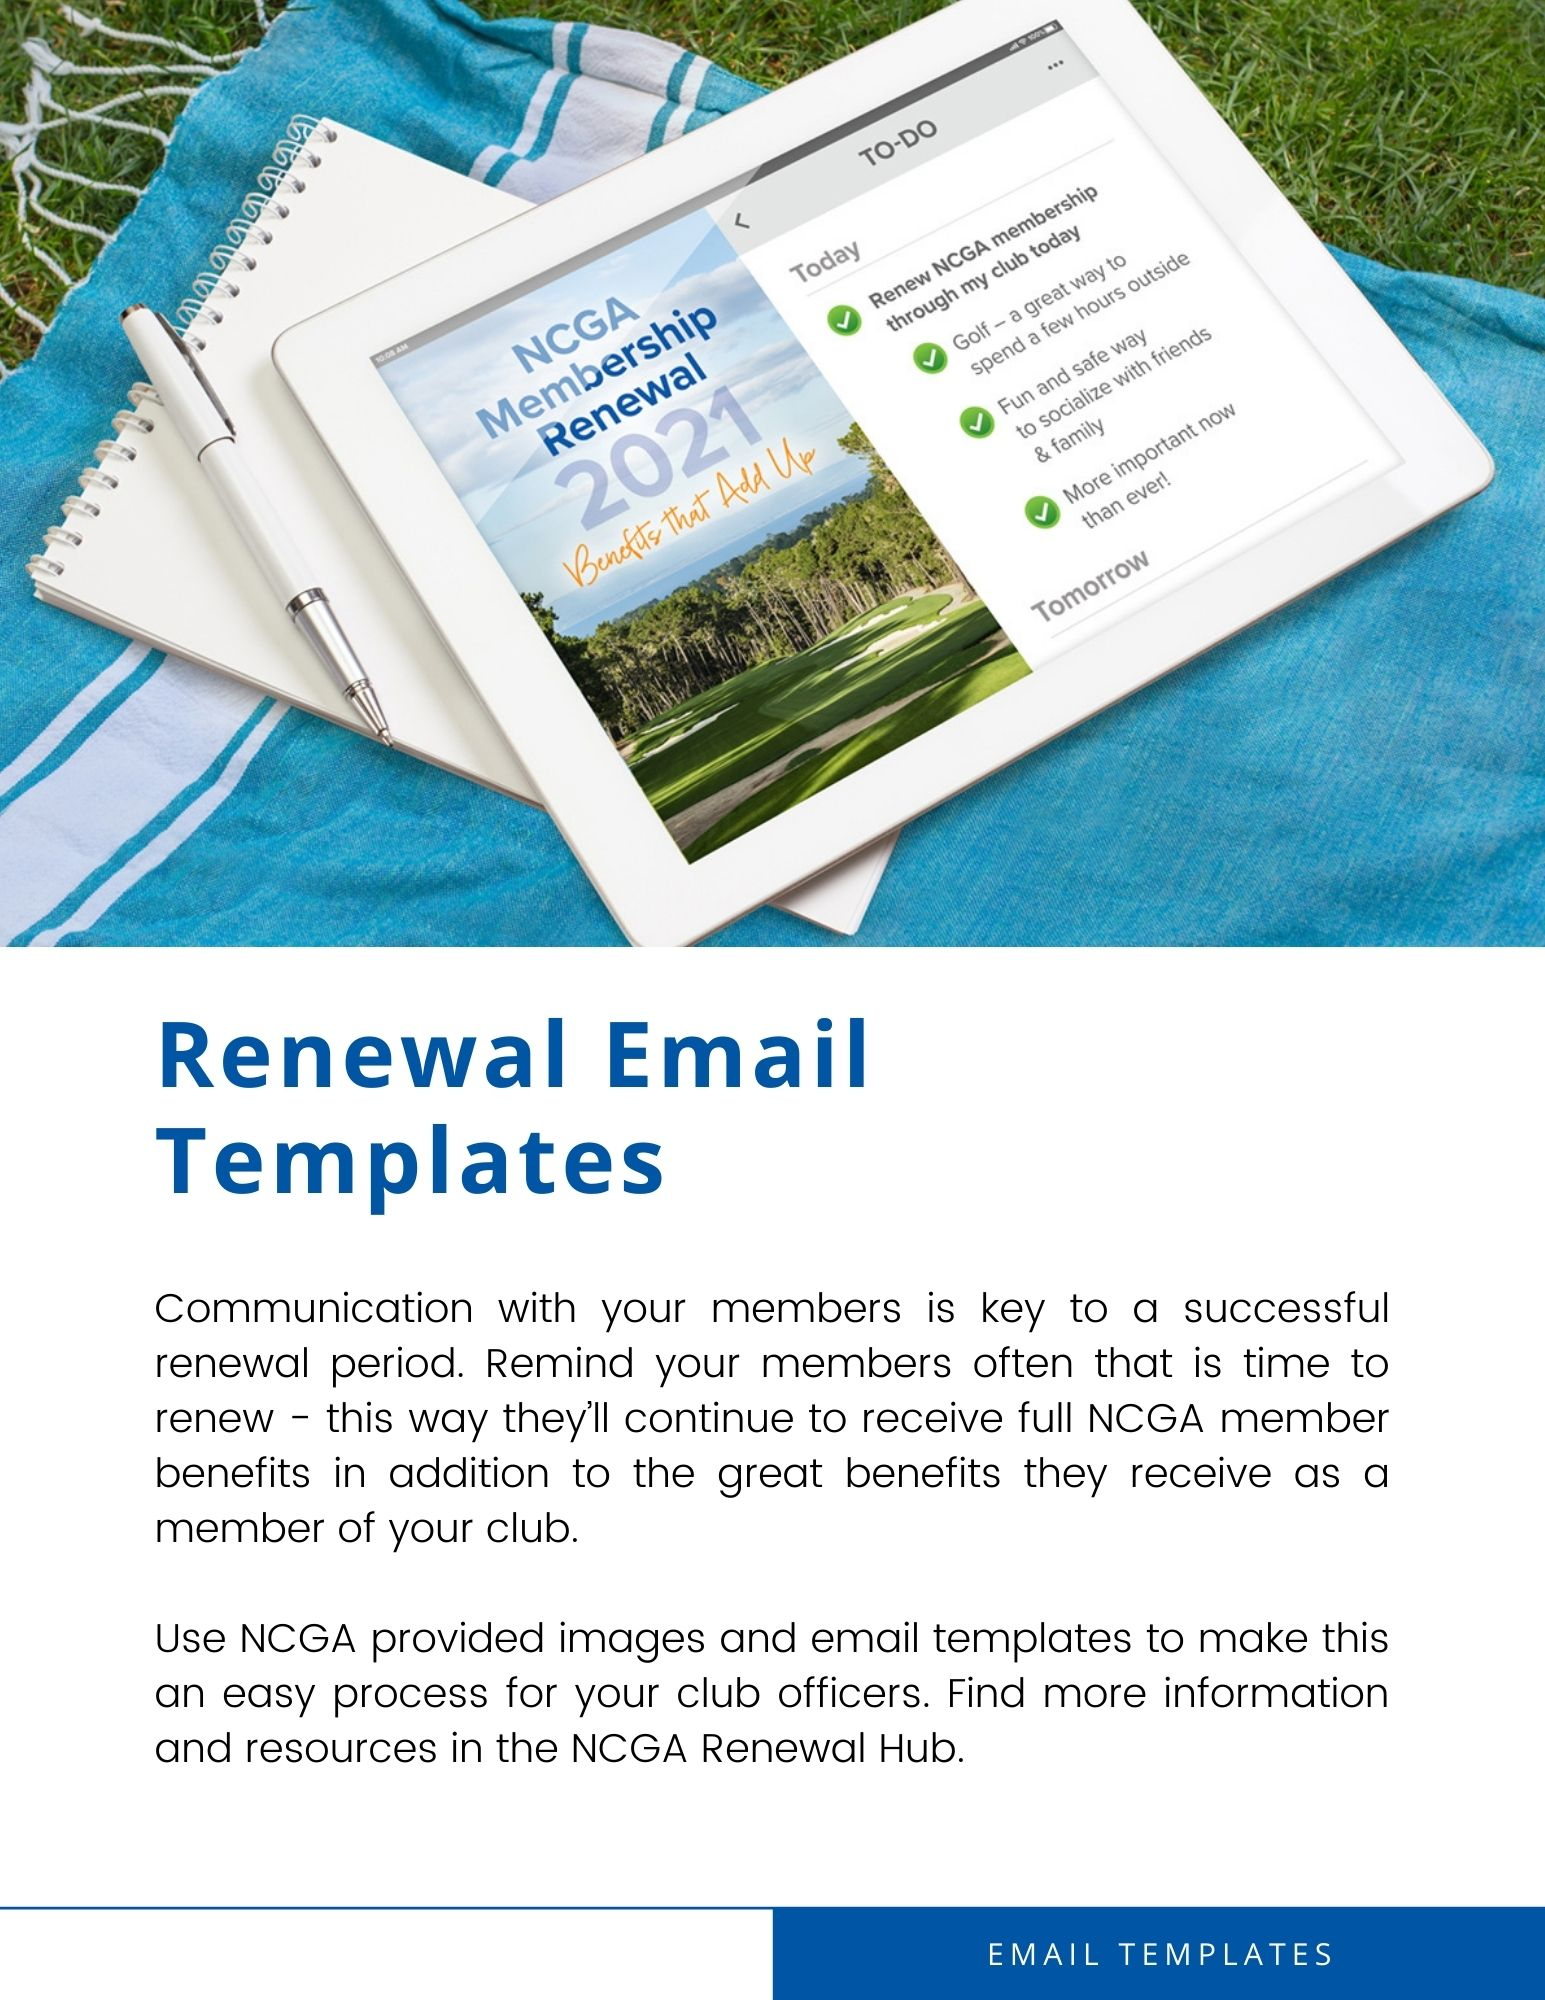 NCGA Renewal Email Templates